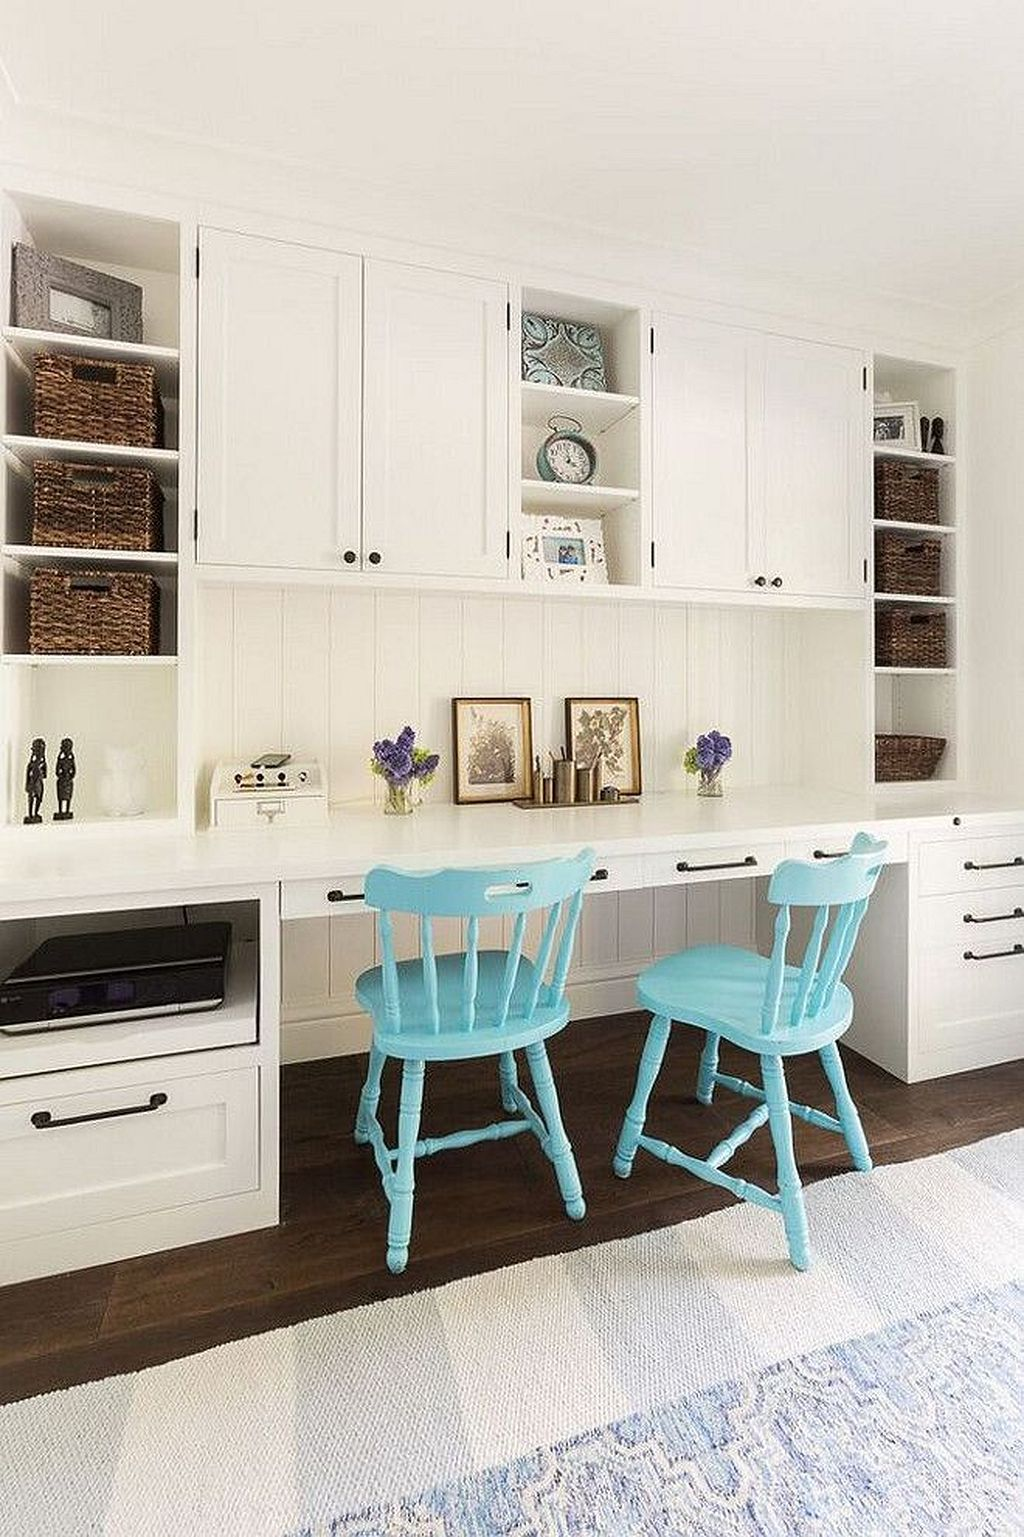 179 Custom Kitchen Cabinets Design Ideas Home Office Decor White Kitchen Design